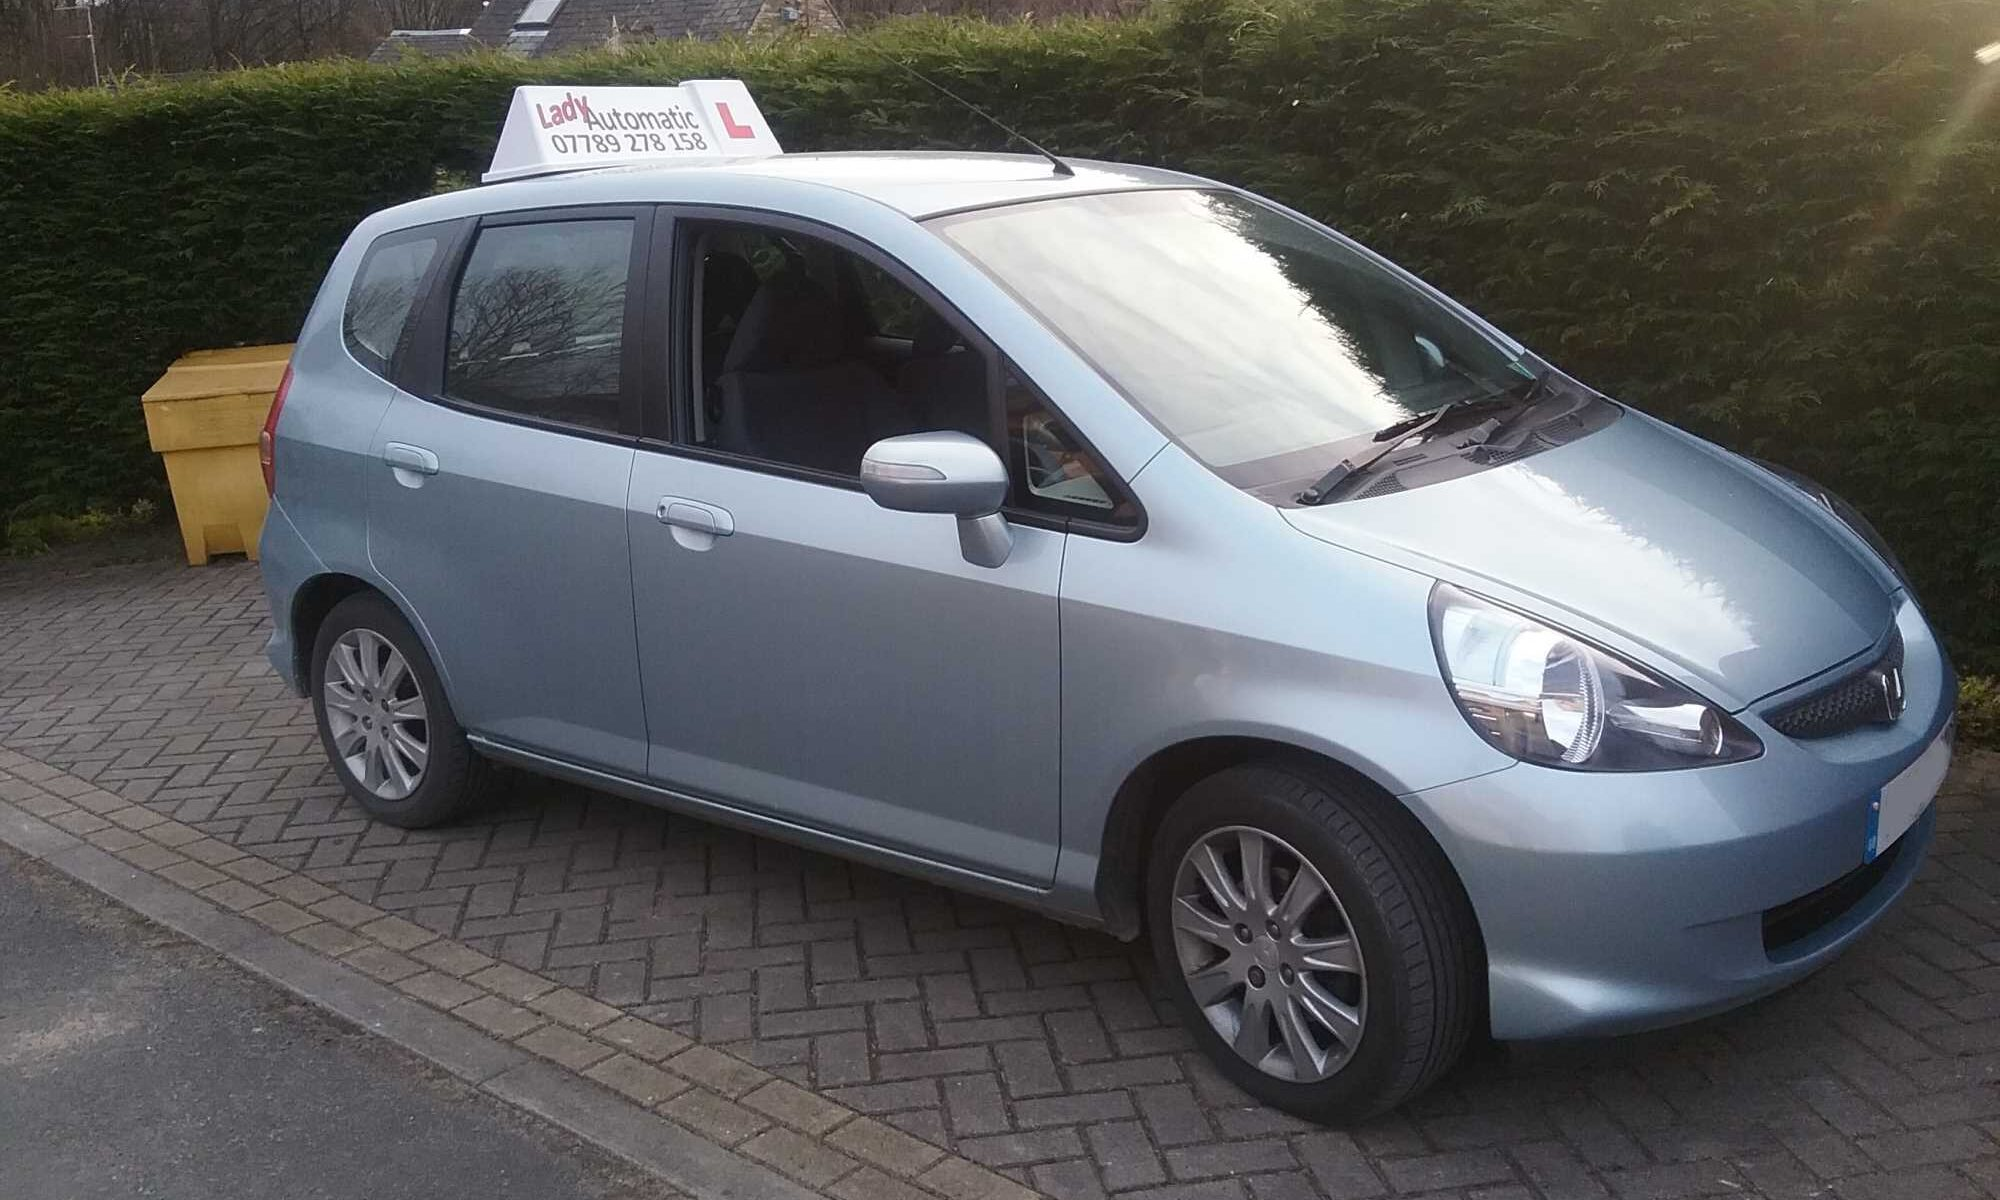 lady-automatic-annita-school-of-motoring-car-three-huddersfield